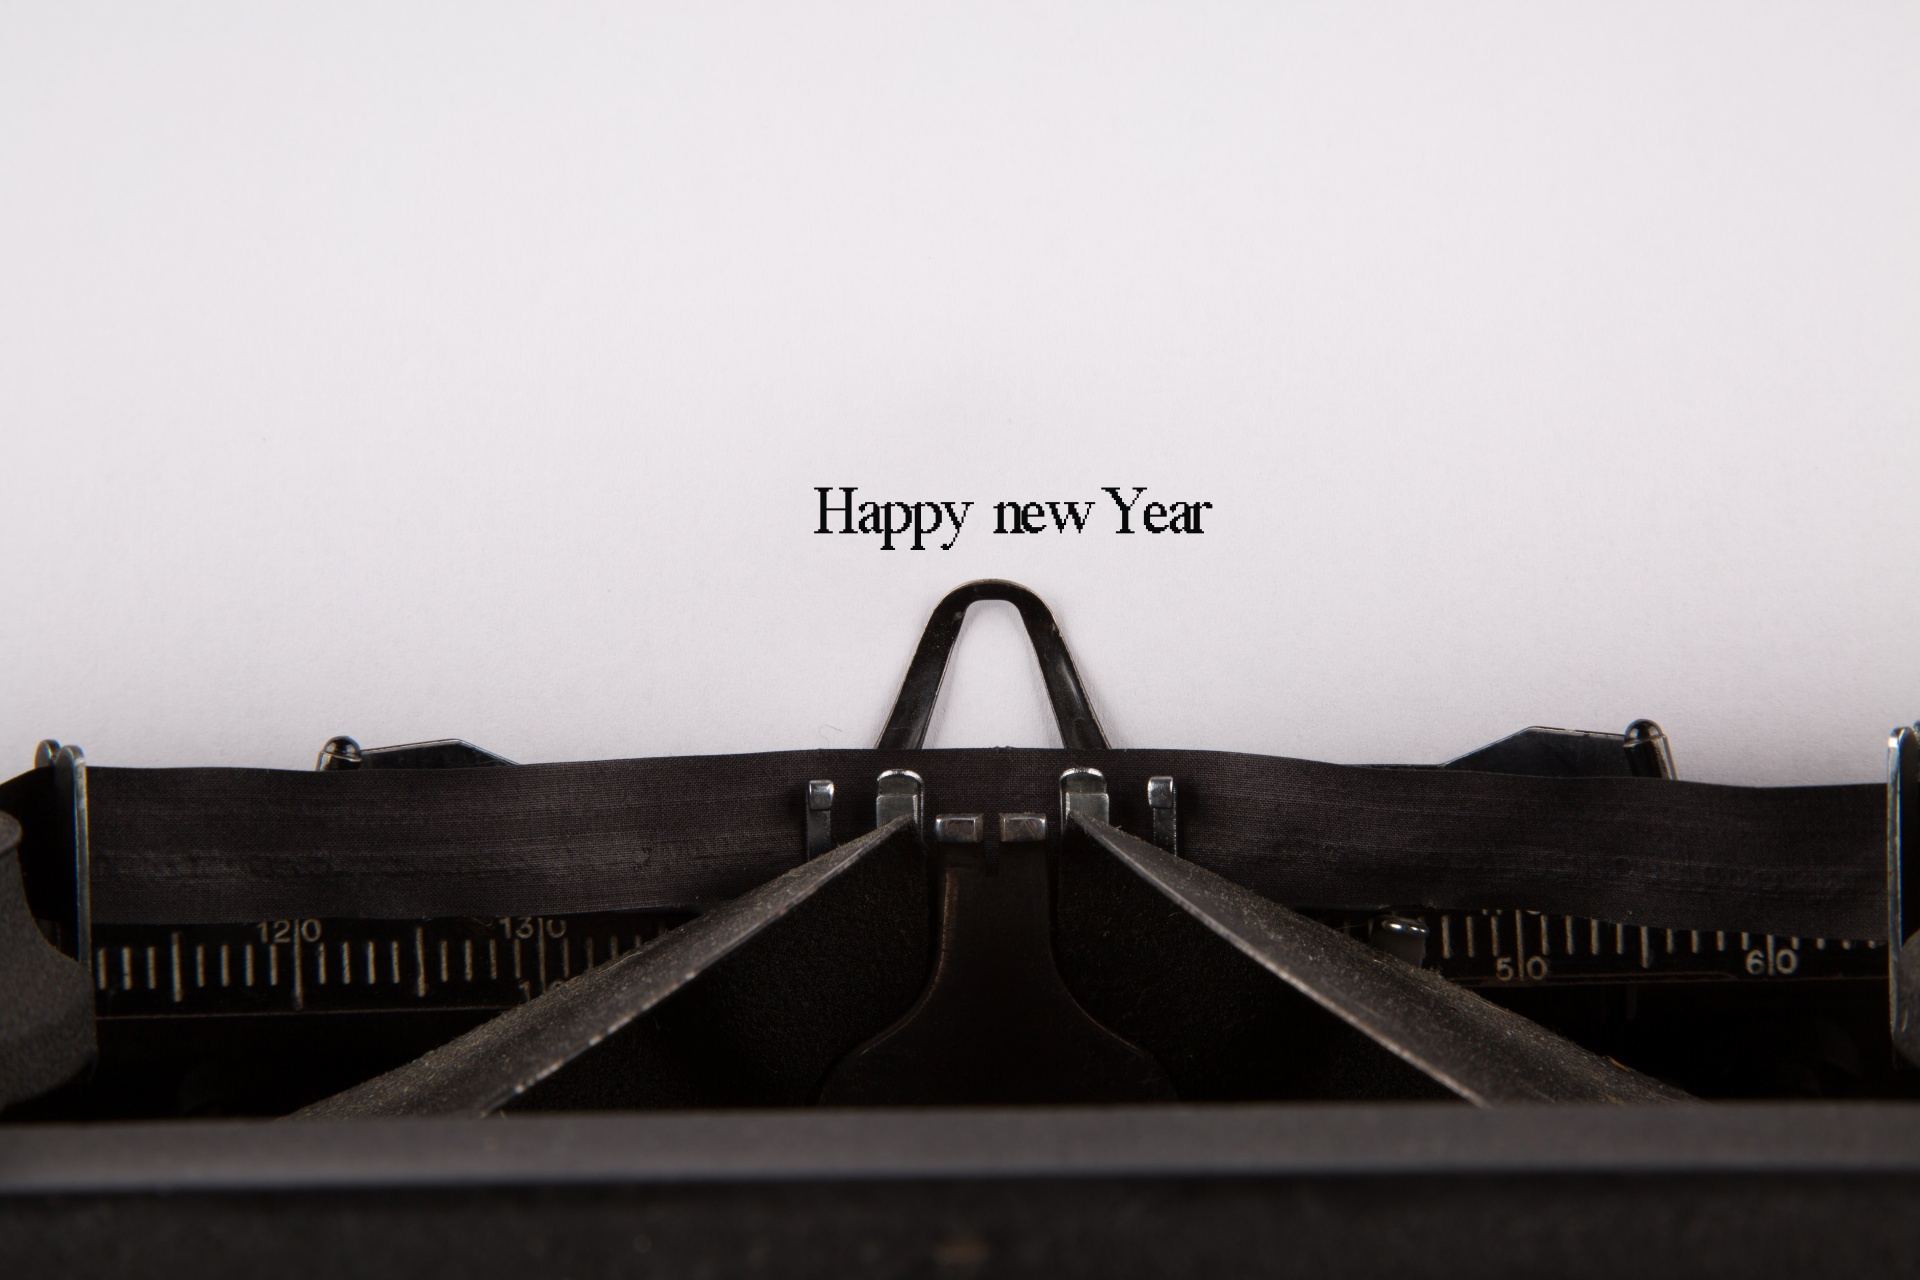 happy-new-year-1464769828kc9.jpg